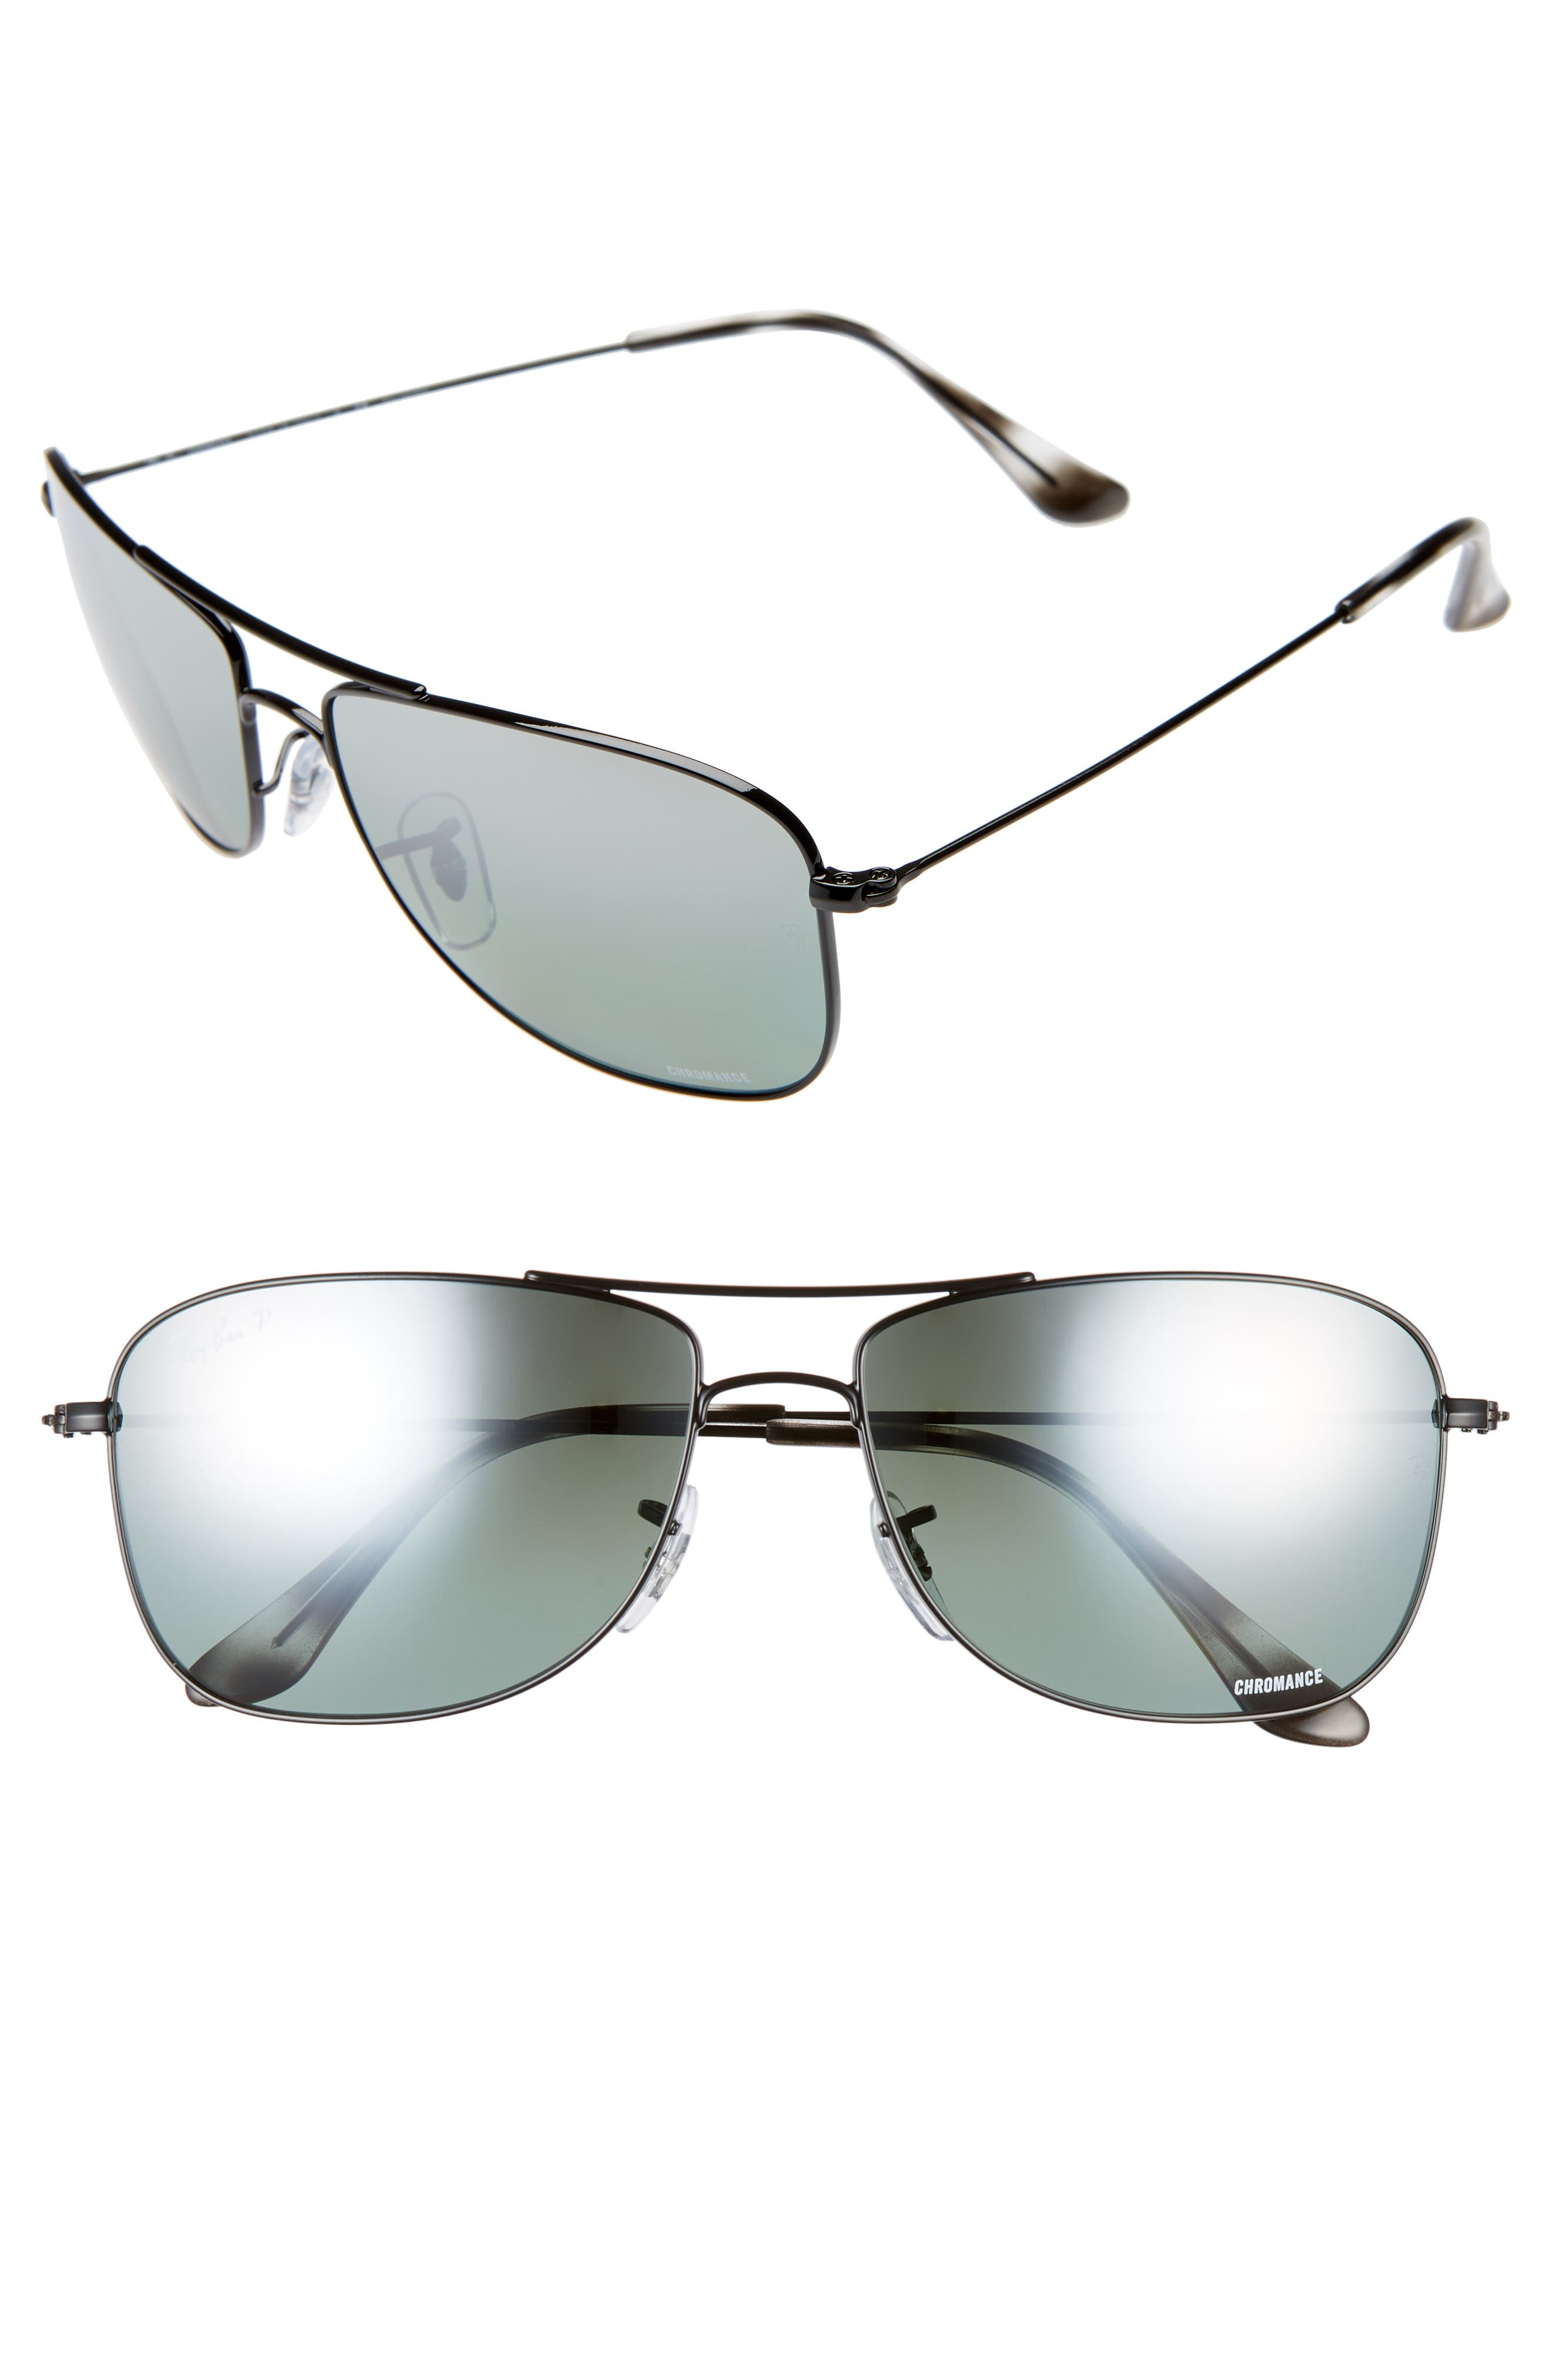 Ray-Ban Tech 5m Polarized Sunglasses - Black Gradient Mirror